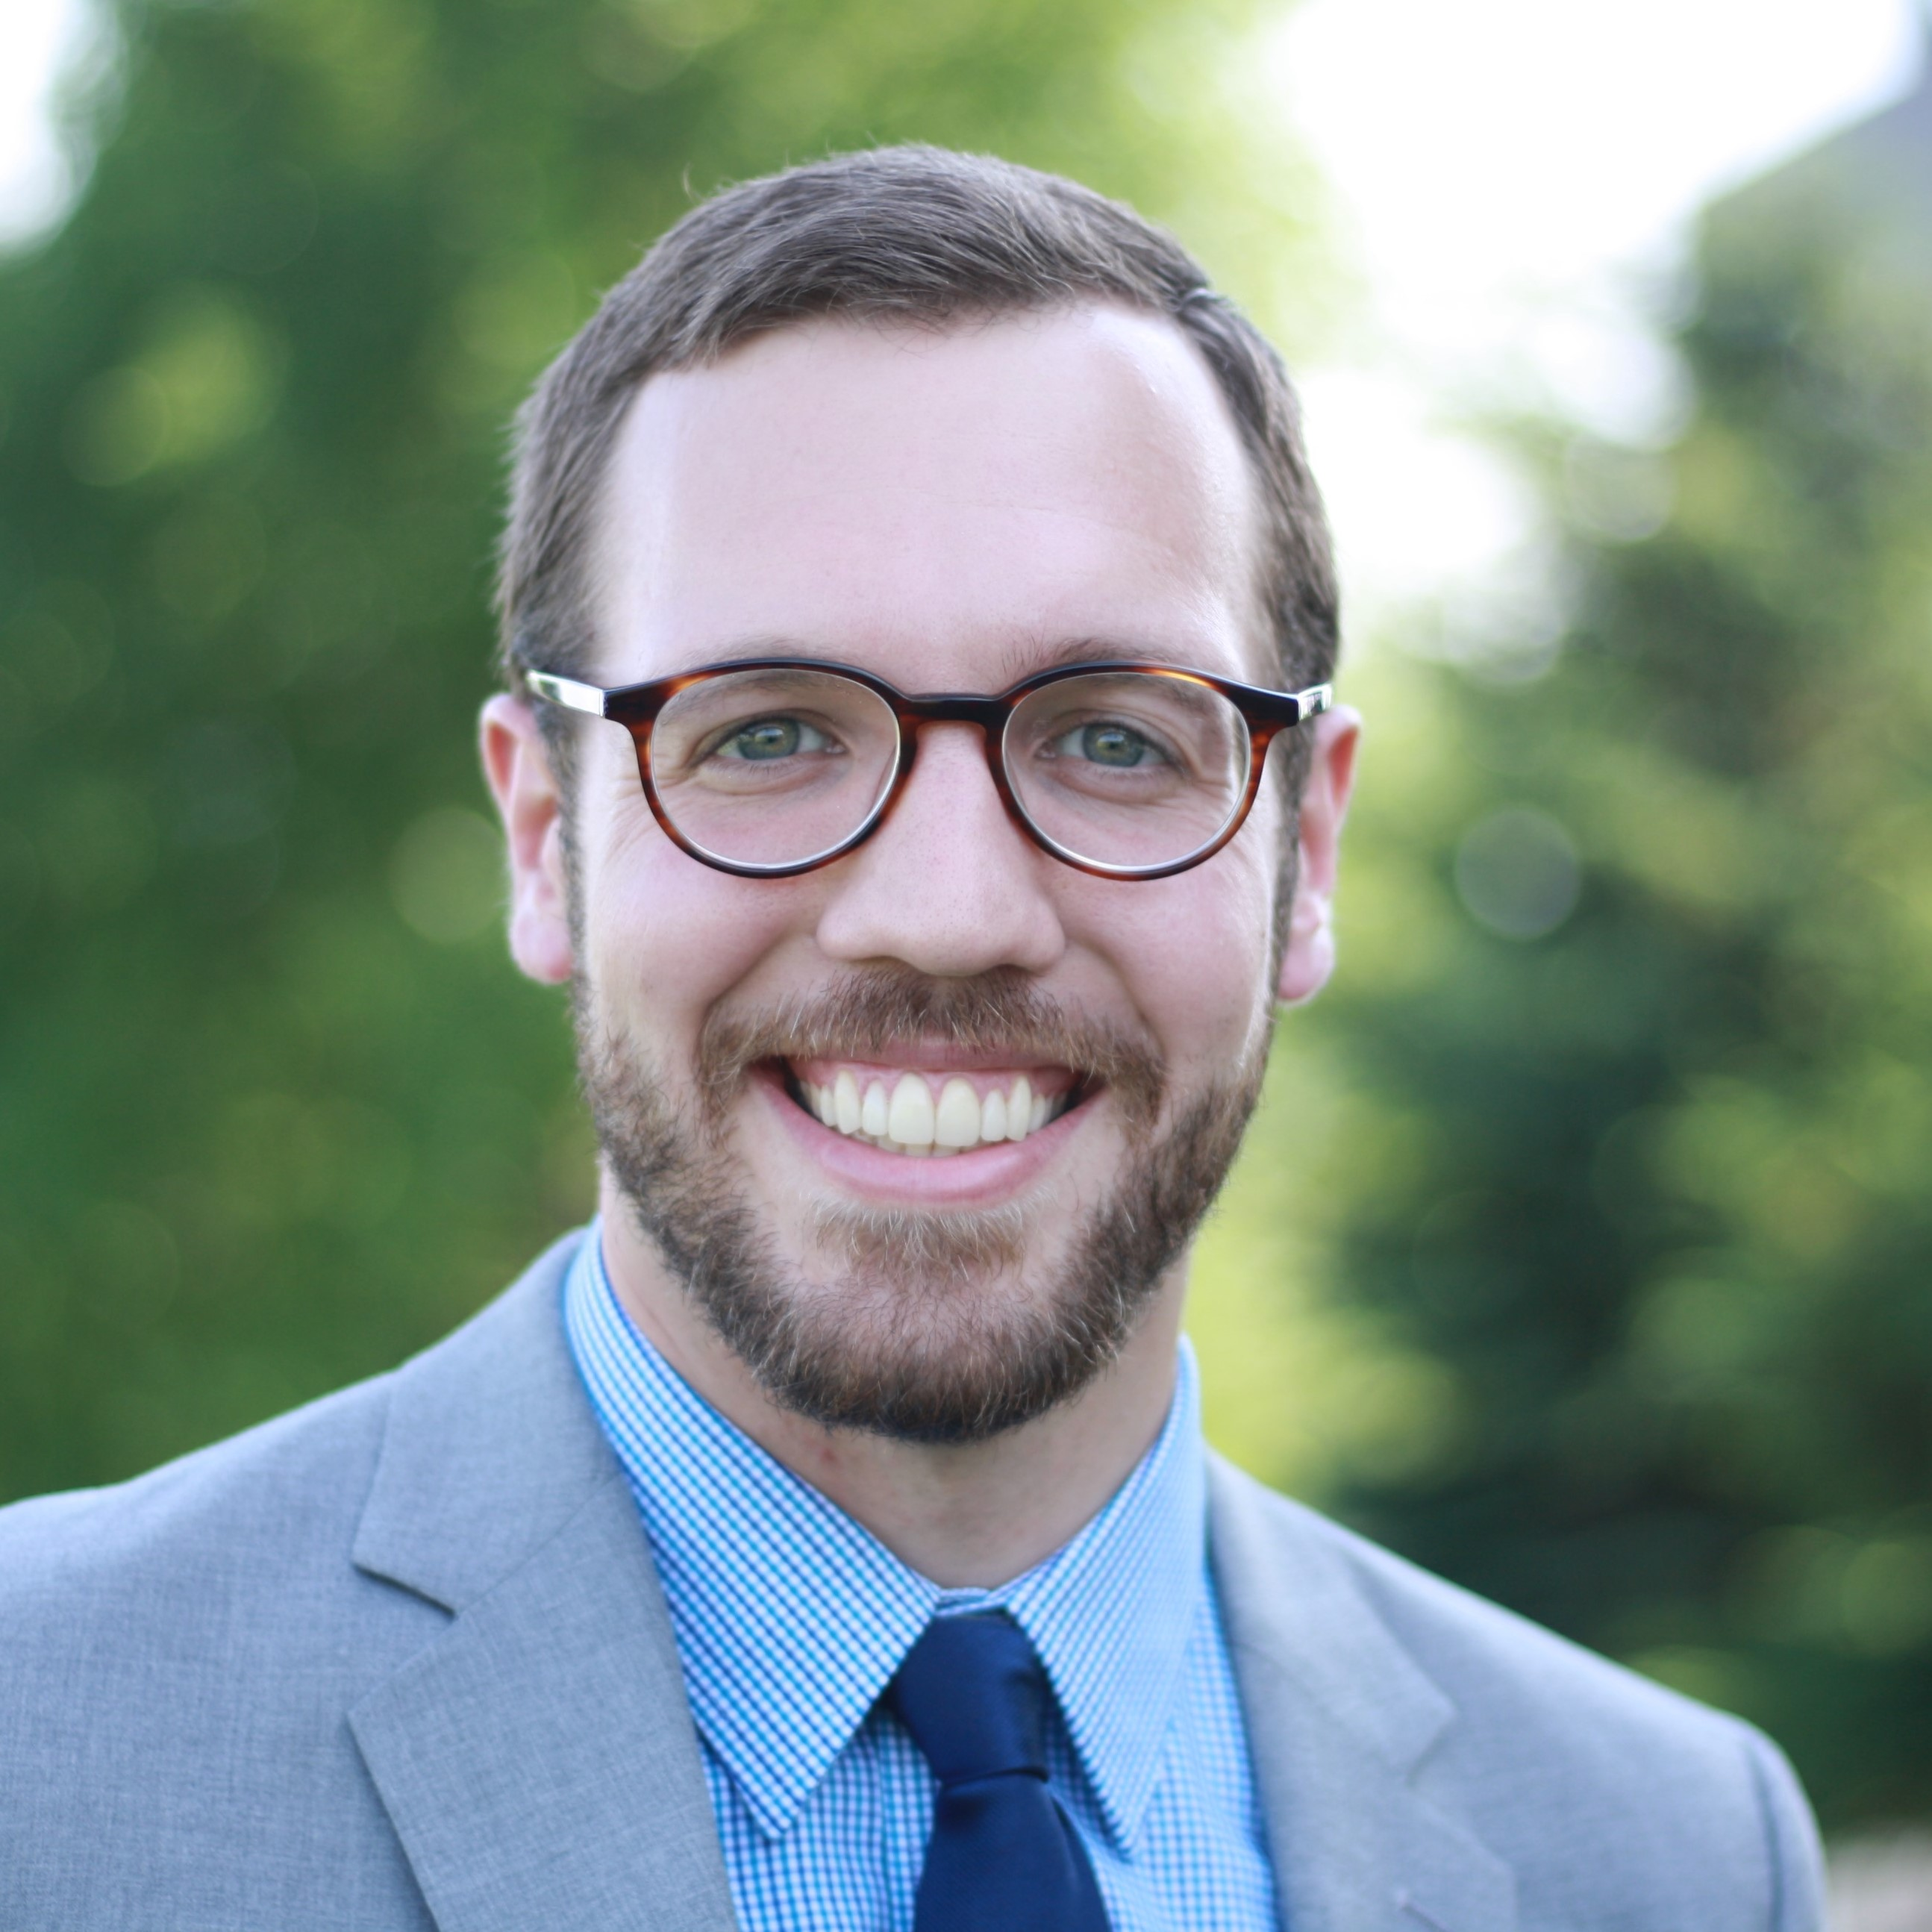 Ethan Smith portrait